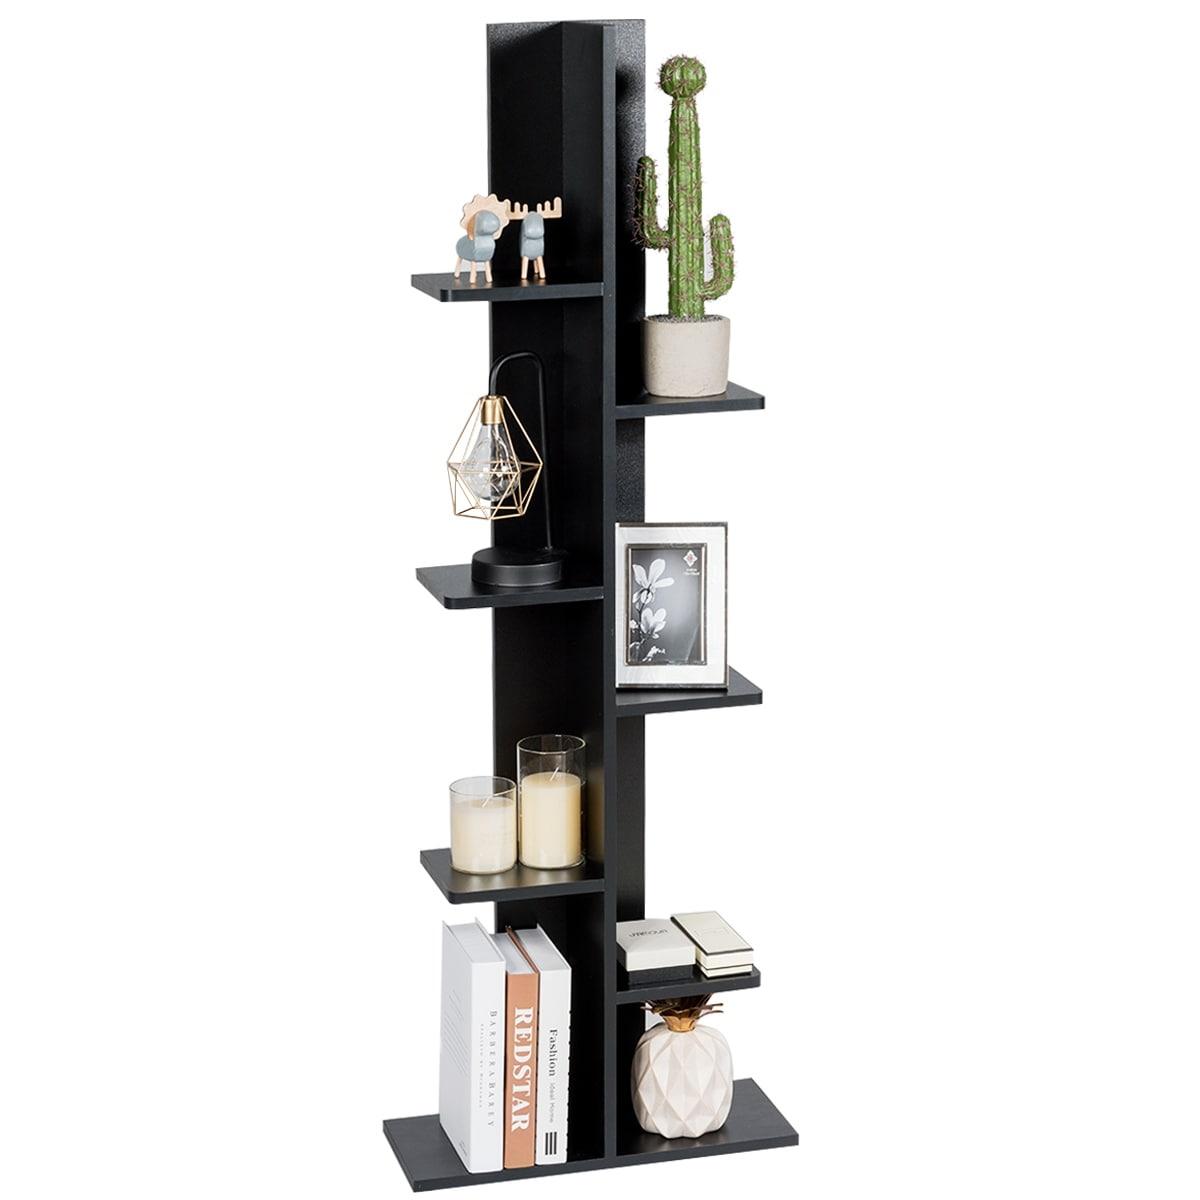 Costway 7-Tier Bookshelf Bookcase Plant Display Shelf Rack Storage Holder Wooden Black